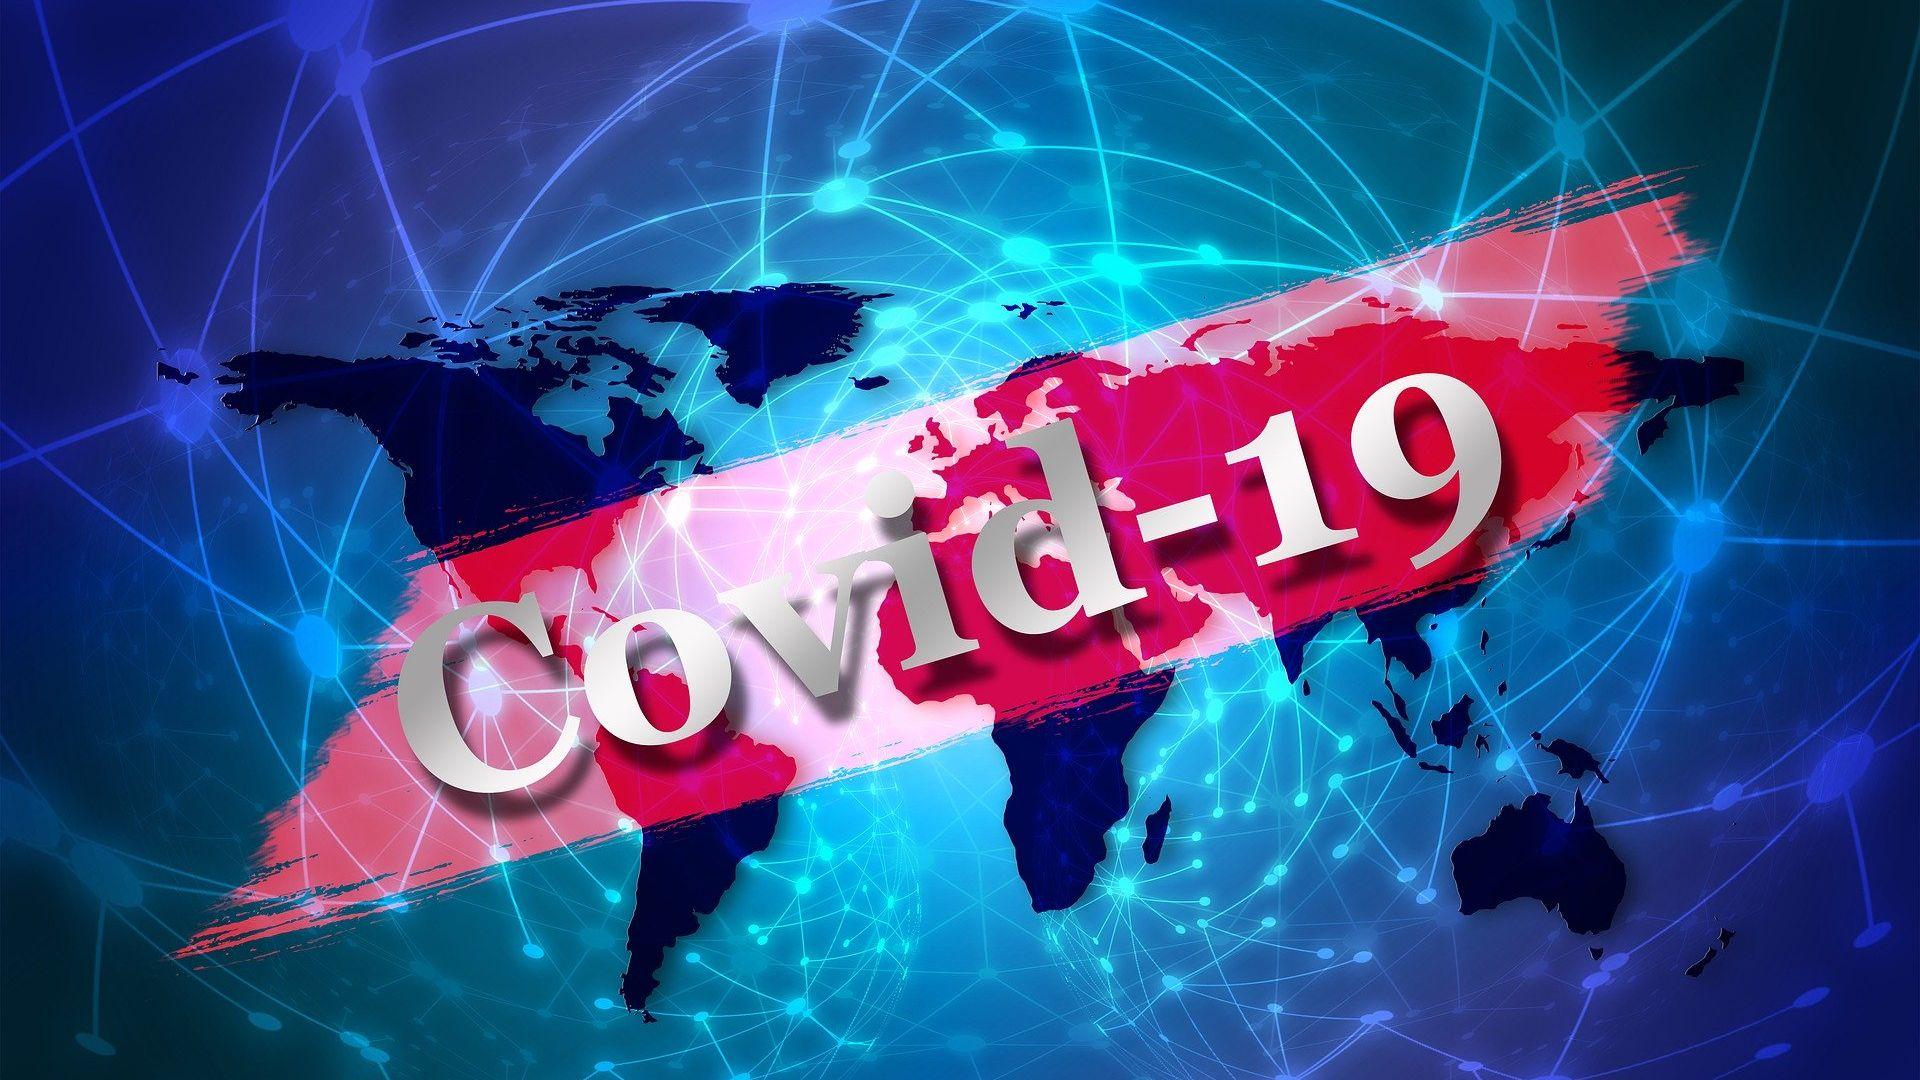 Covid-19: Corona-Ticker: ZAW sagt Plenum der Werbung 2020 ab